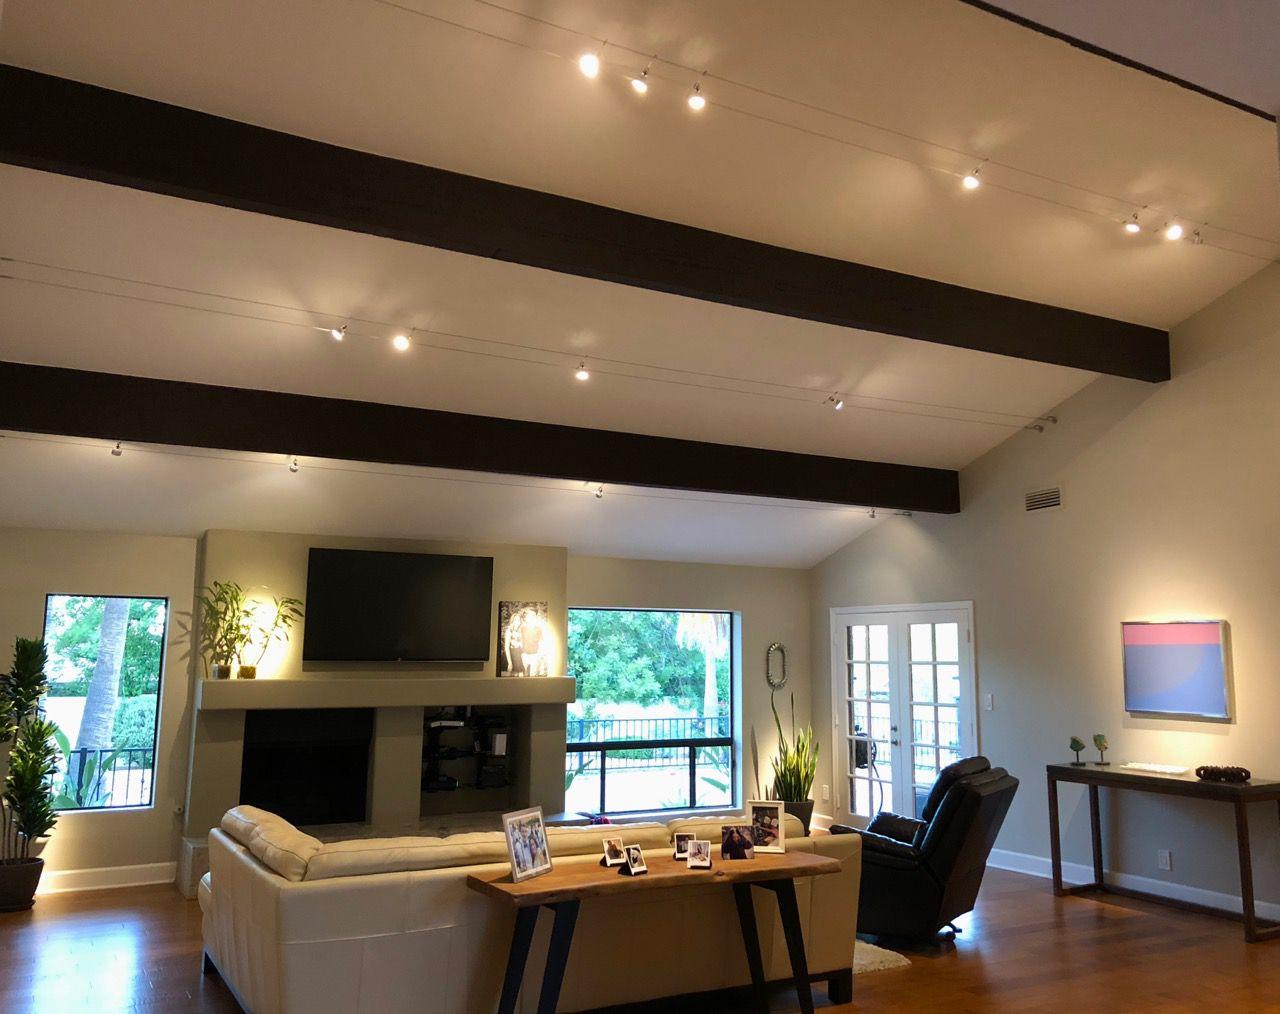 & Private Residence Phoenix - Lightform Lighting